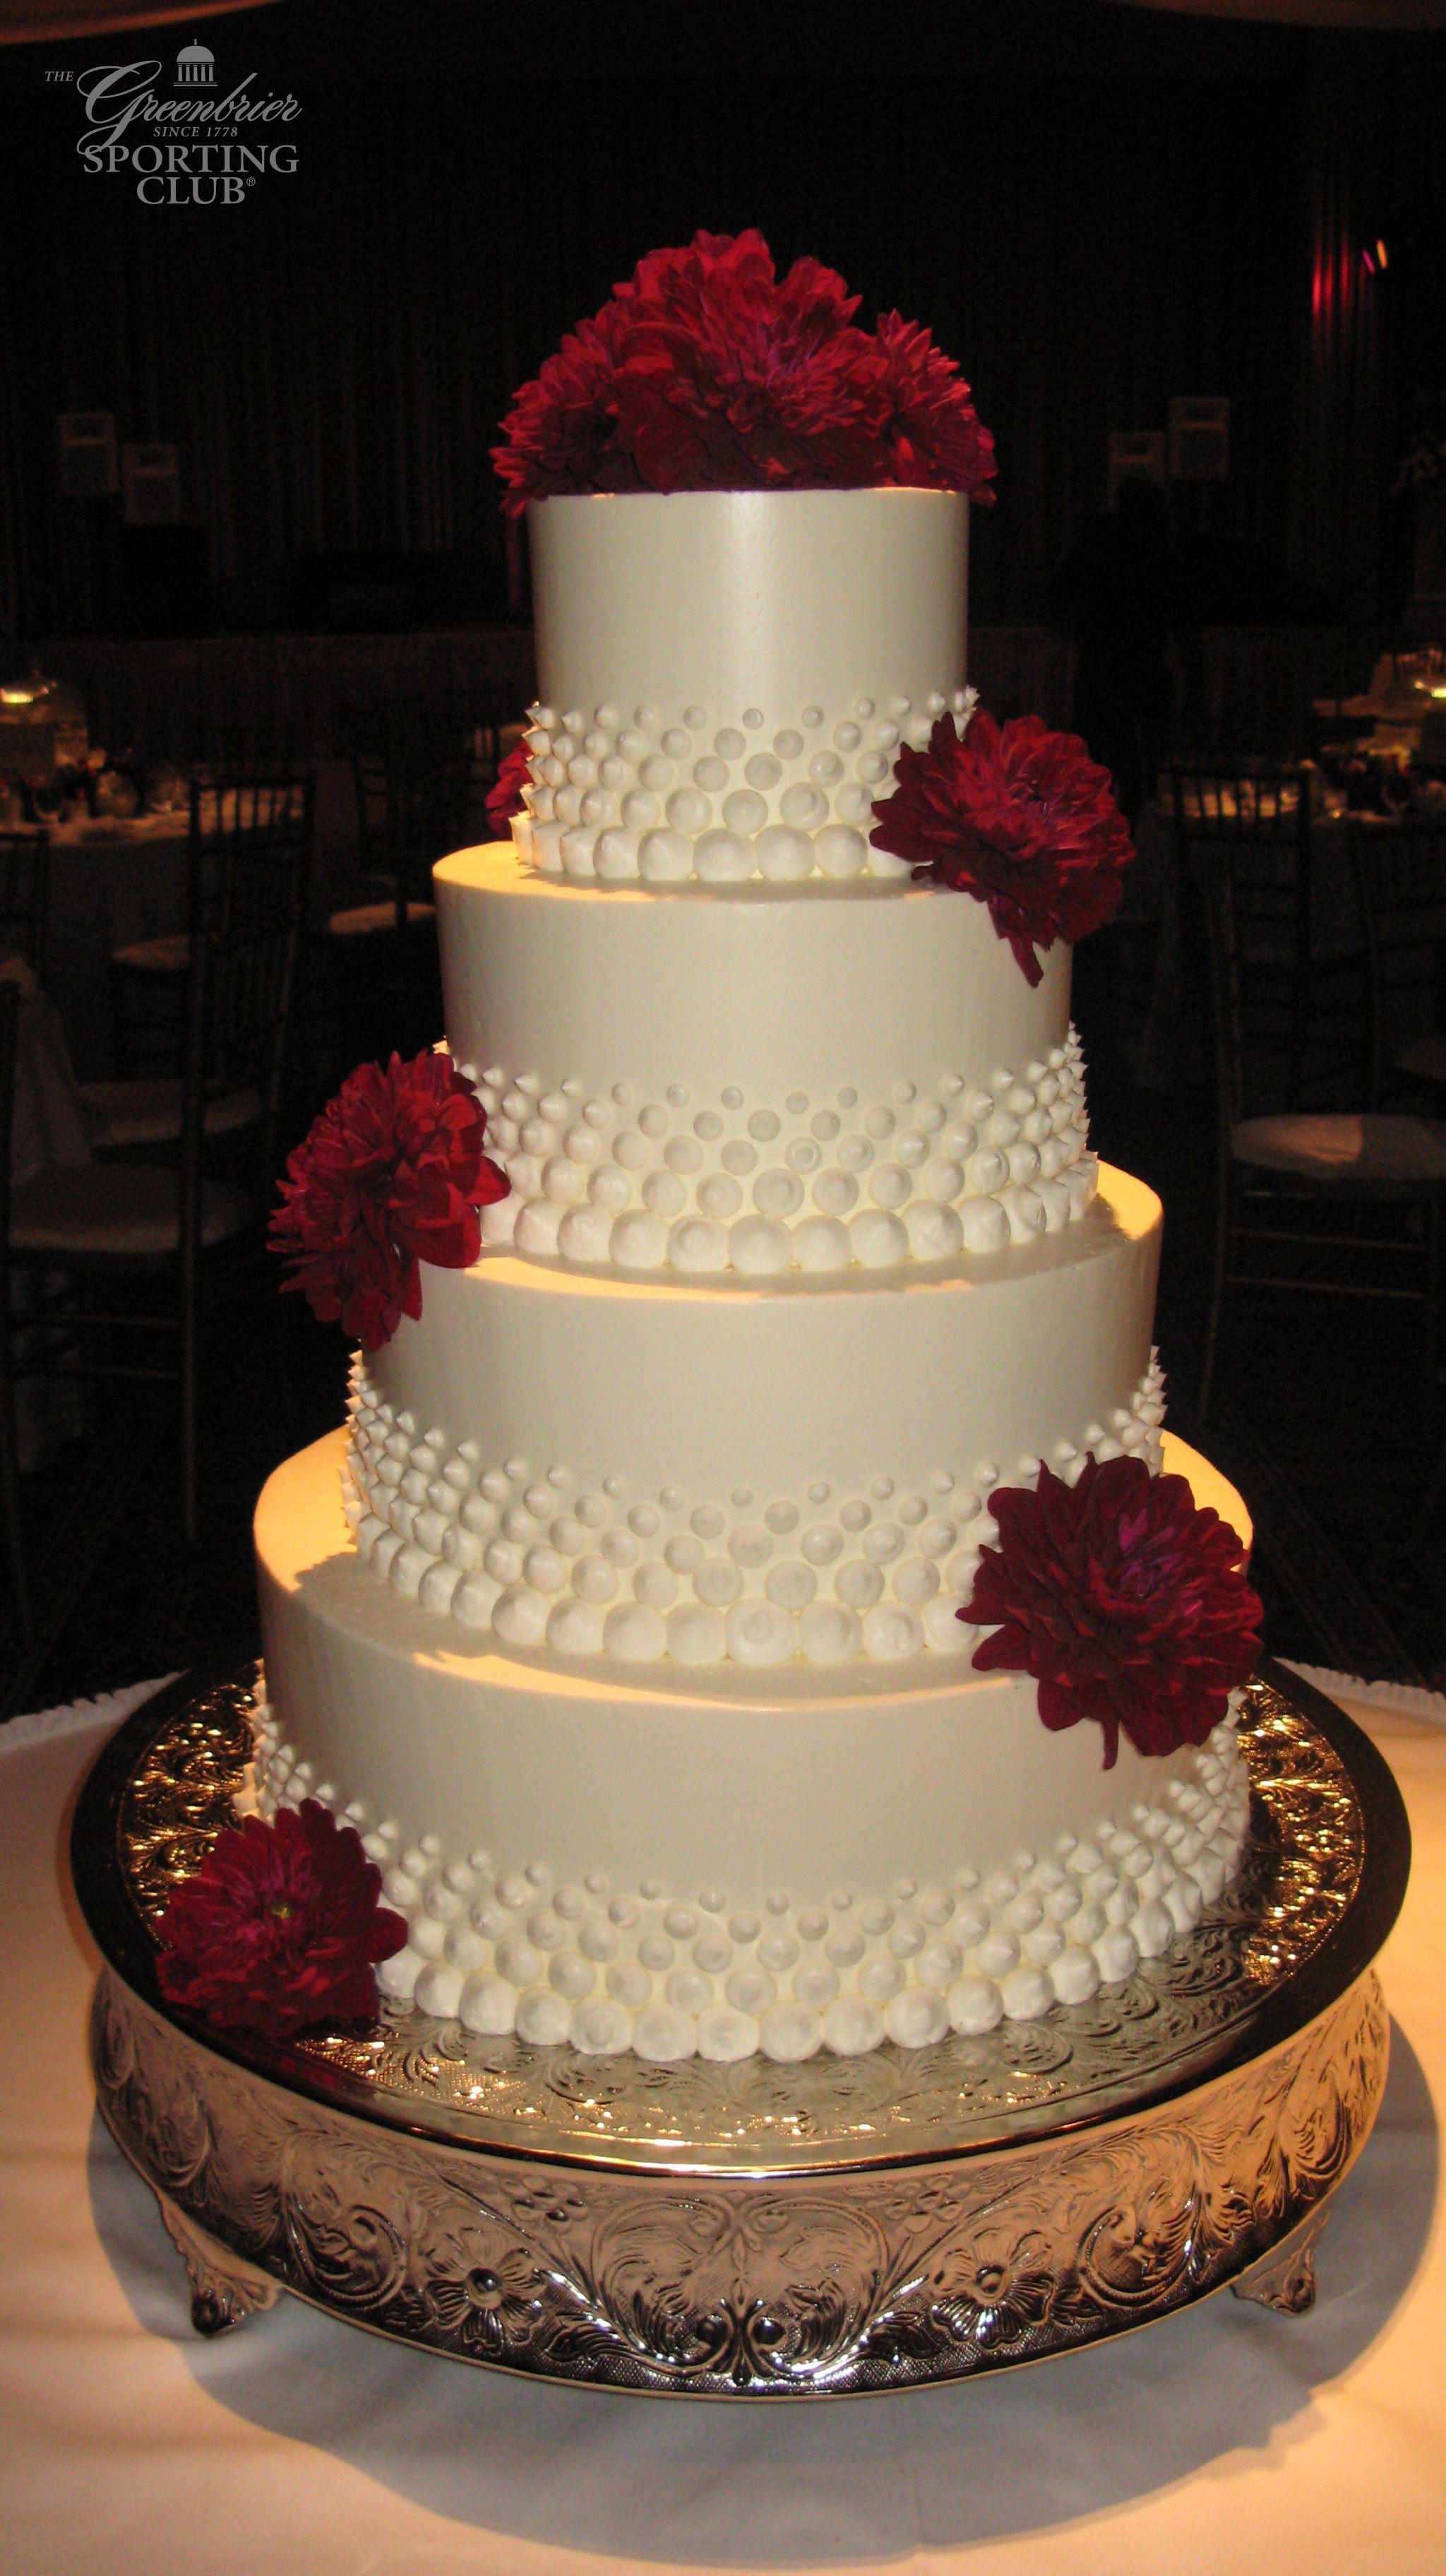 Image result for romantic wedding cake red roses so lovely